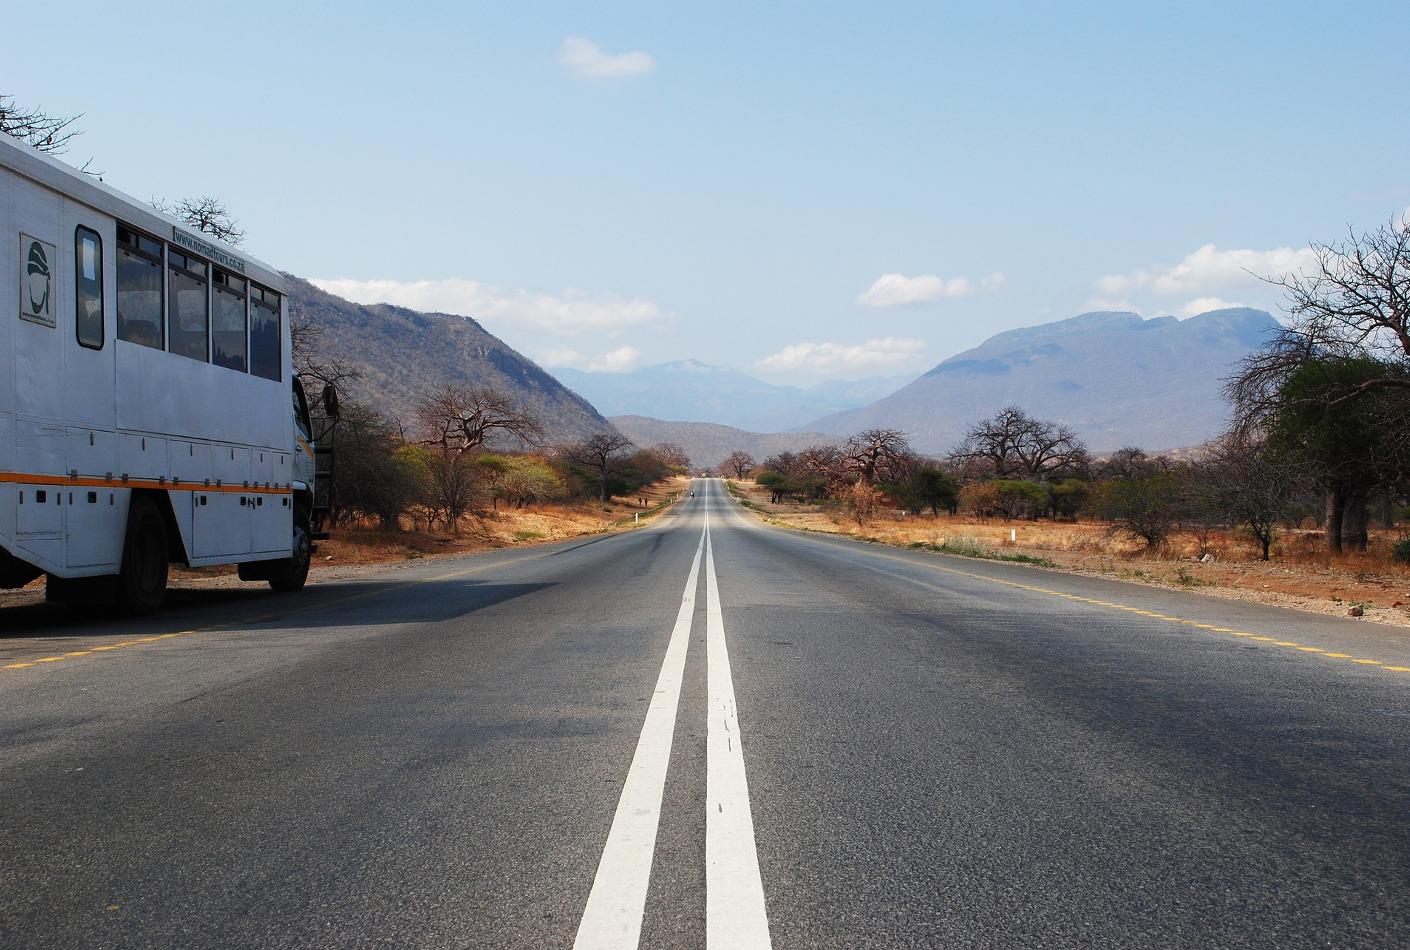 Carretera de Tanzania, África